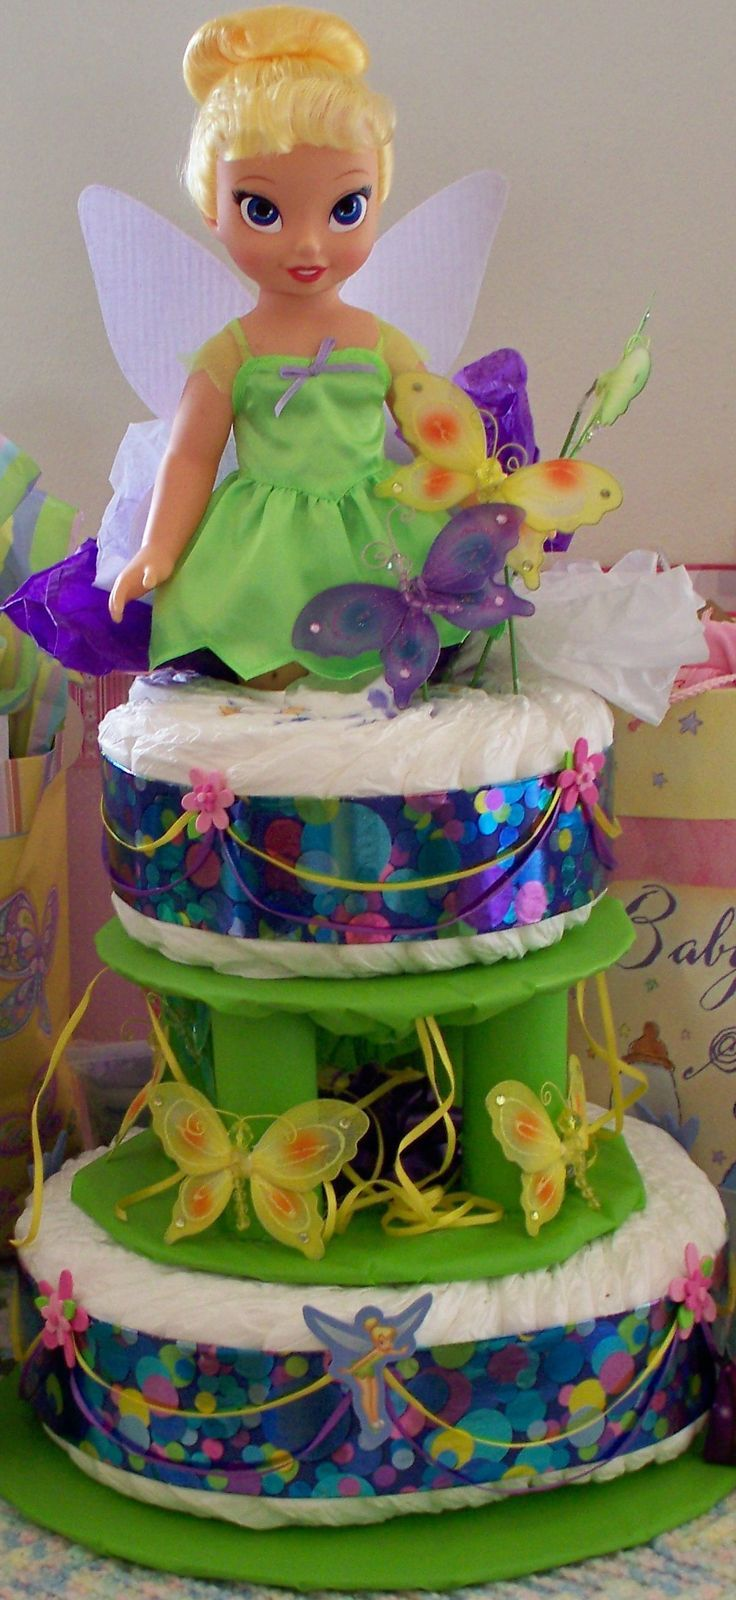 Tinkerbell Diaper Cake | Made This Tinker Bell Diaper Cake